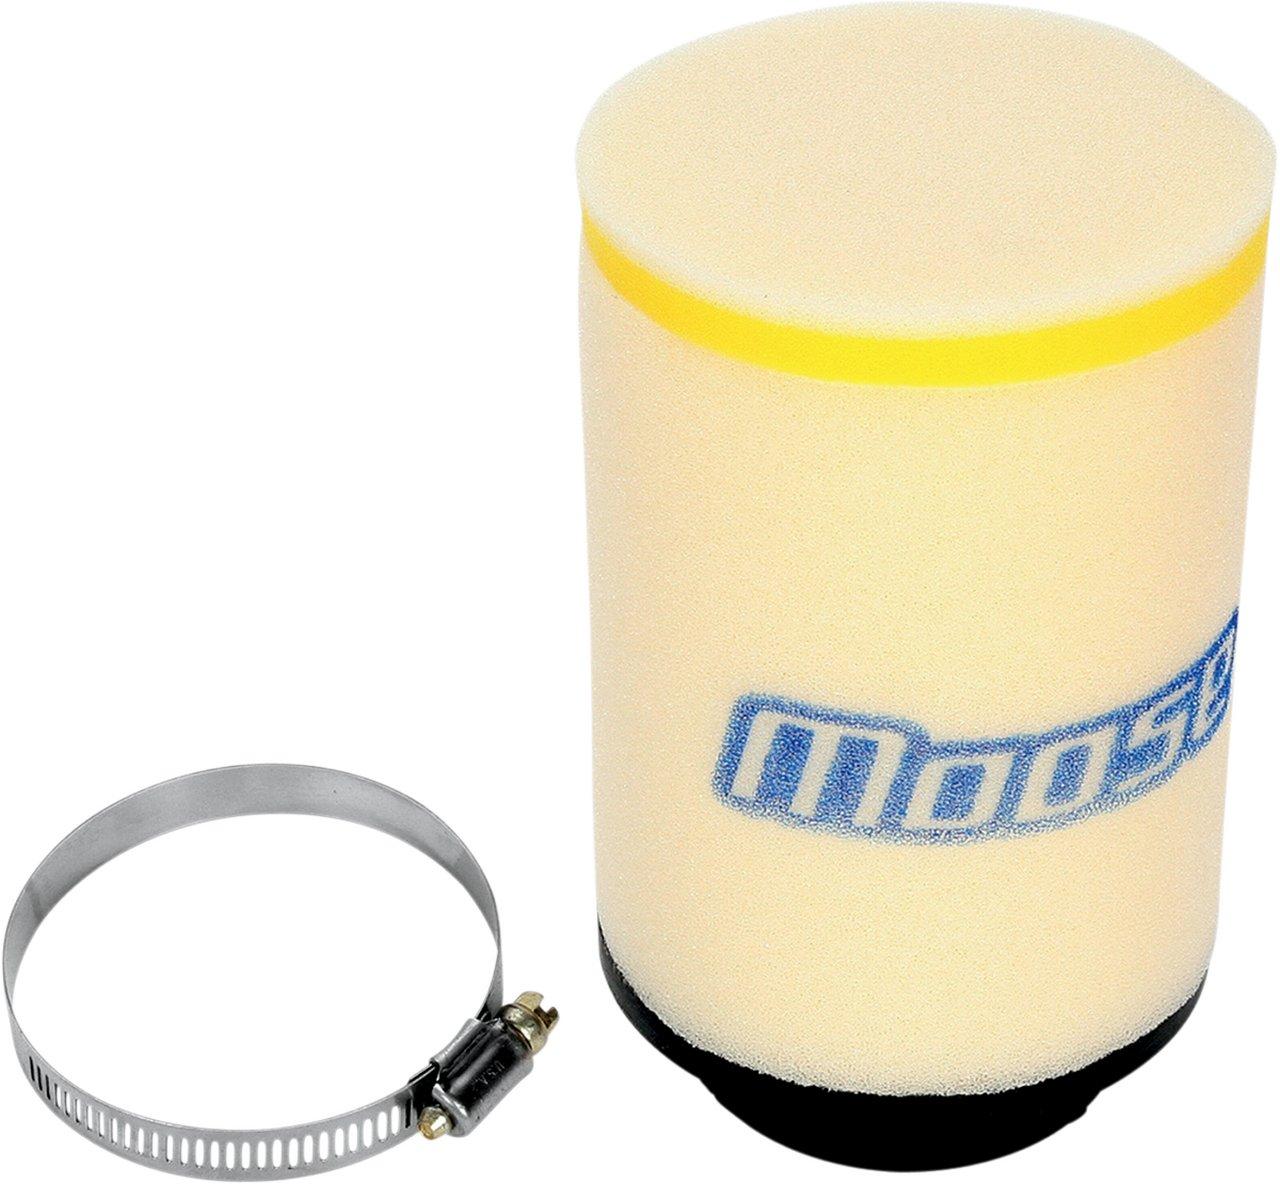 【MOOSE RACING】PPO (PRECISION PRE-OILED) 空氣濾芯 [M763-20-12] - 「Webike-摩托百貨」